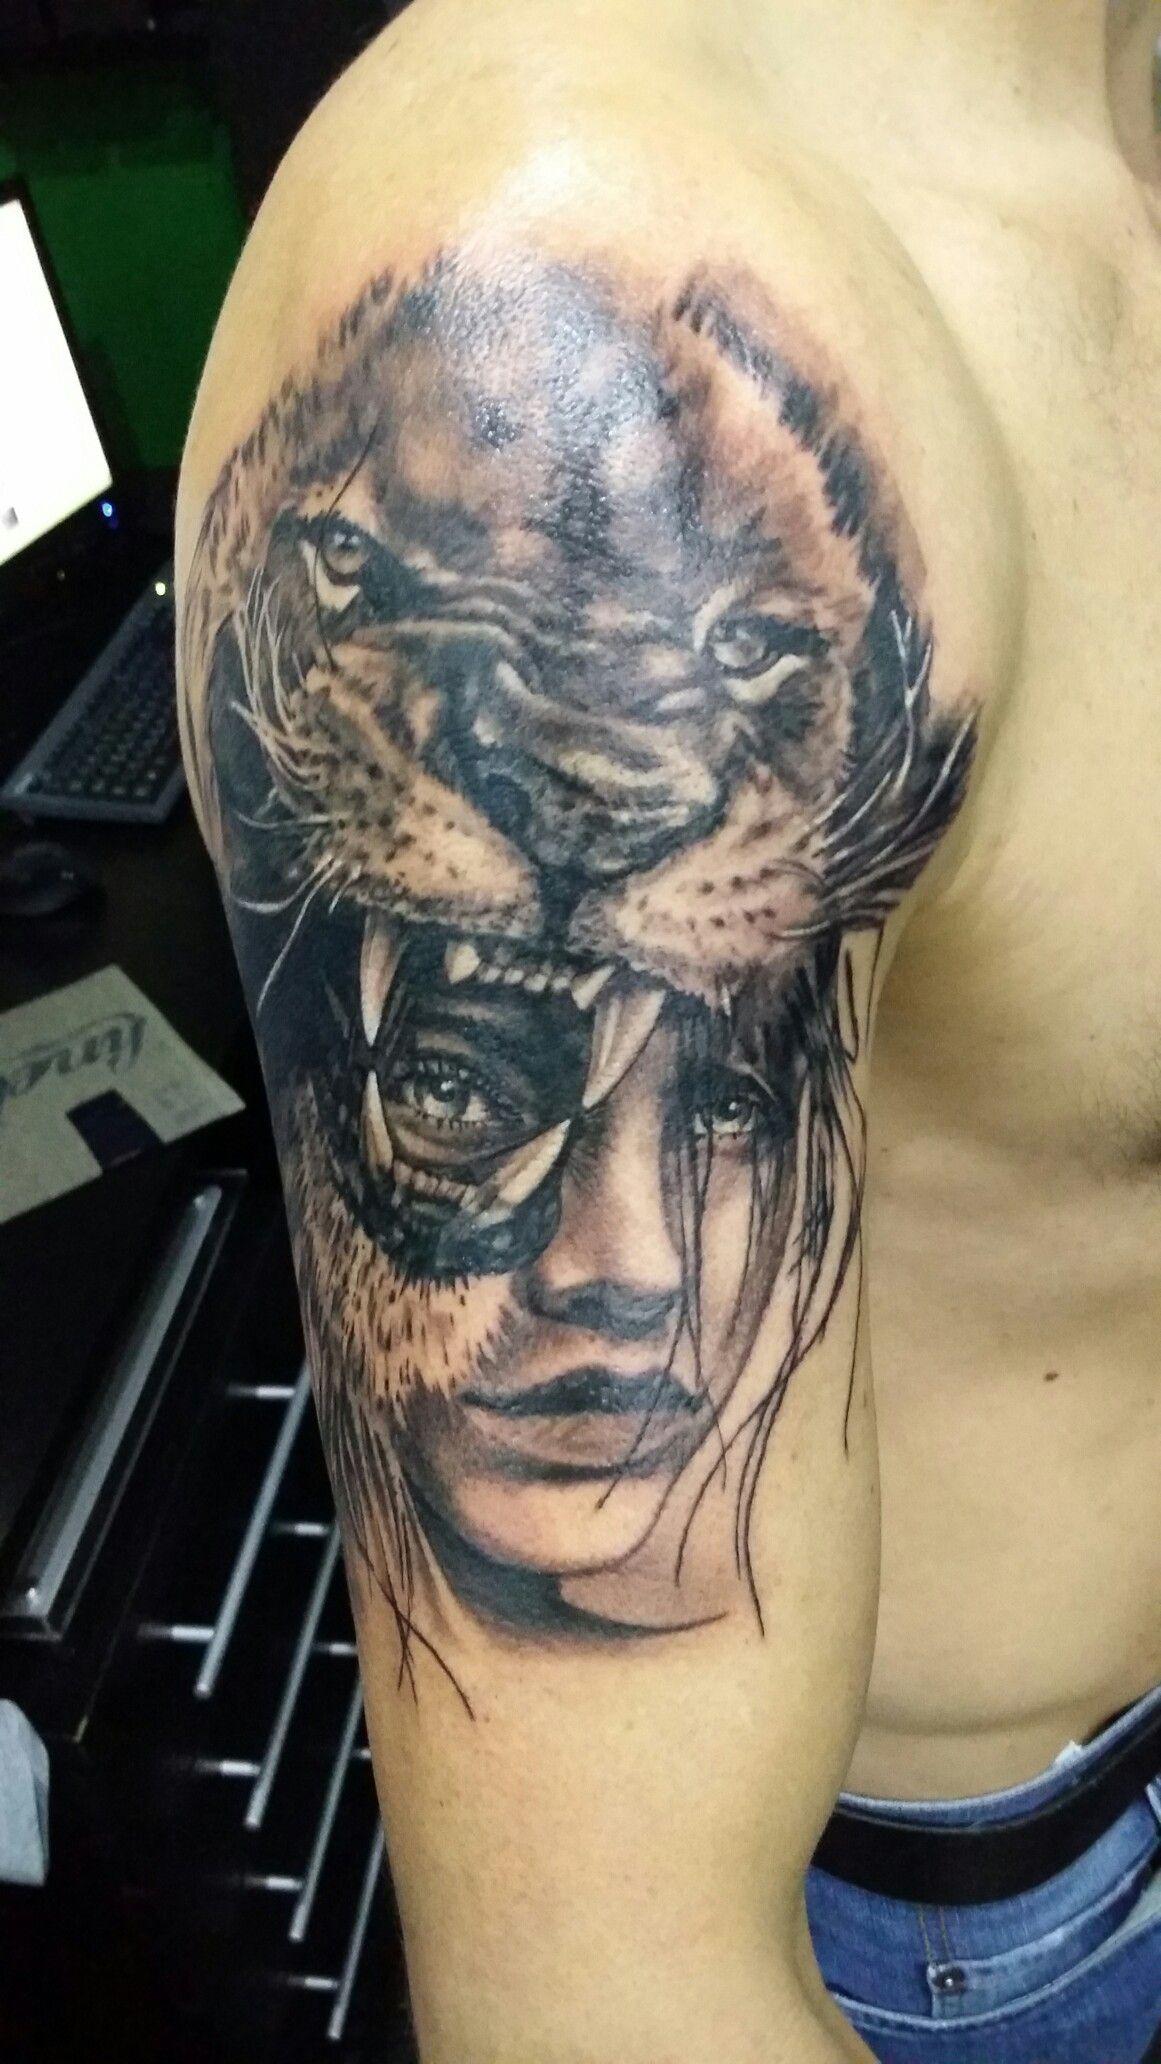 2d96d320b Lion tattoo, Indian woman with lion, black & gray tattoo, girl with lion  head tattoo, woman with lion head tattoo, woman with lion headdress tattoo